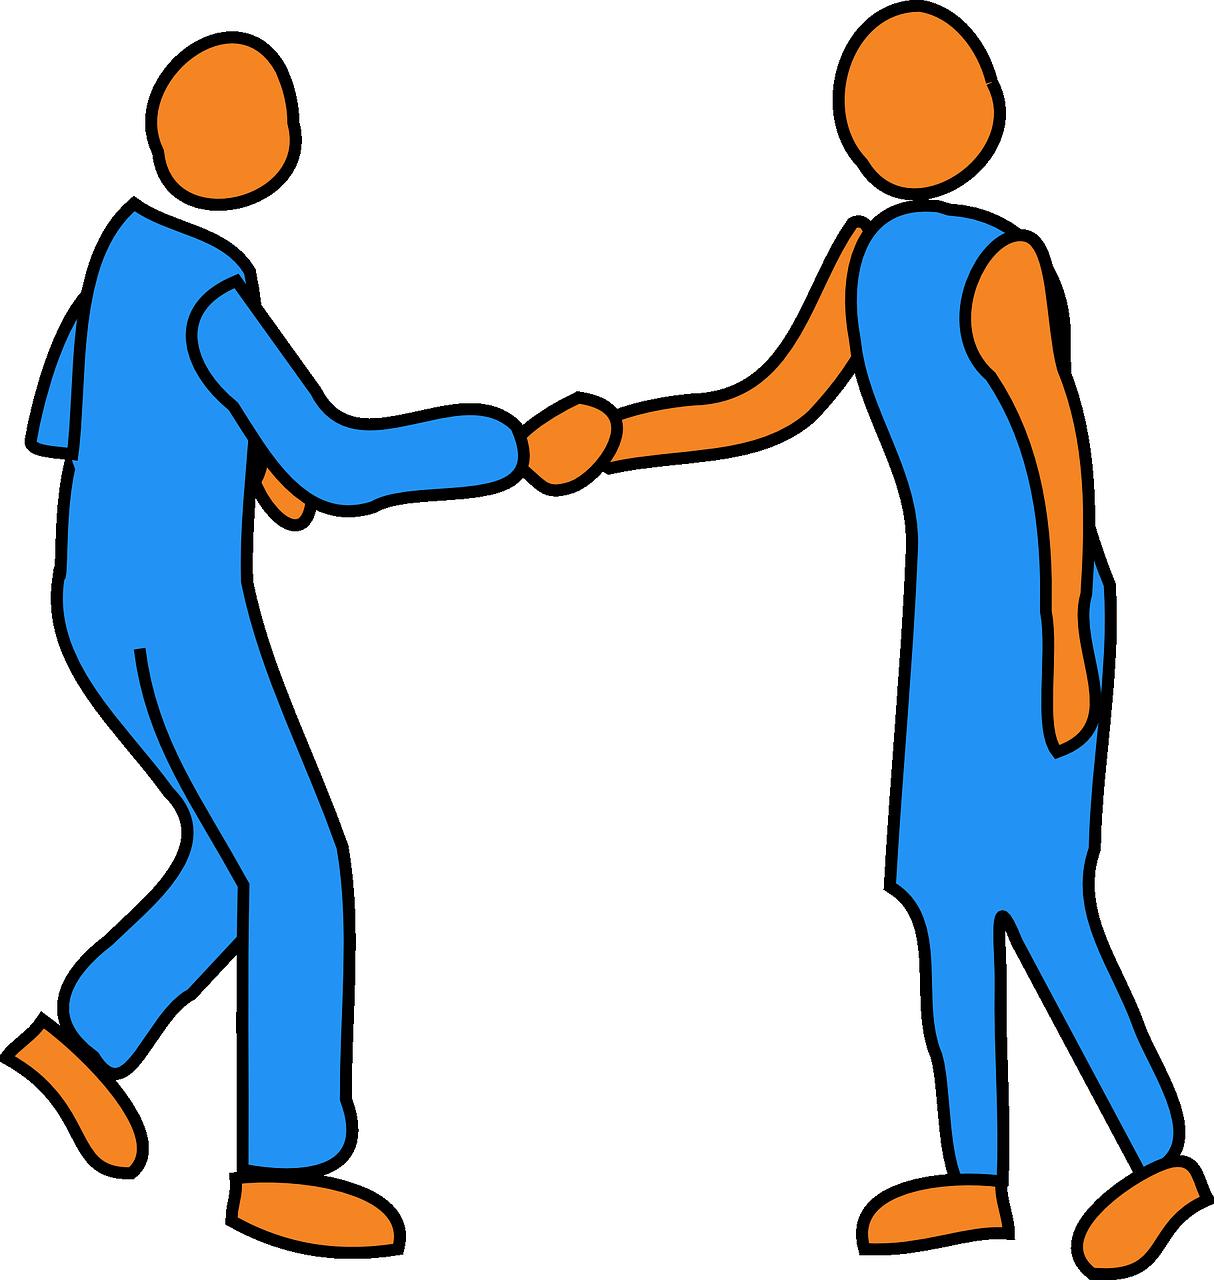 Handshake clipart retro. Man woman friends transparent